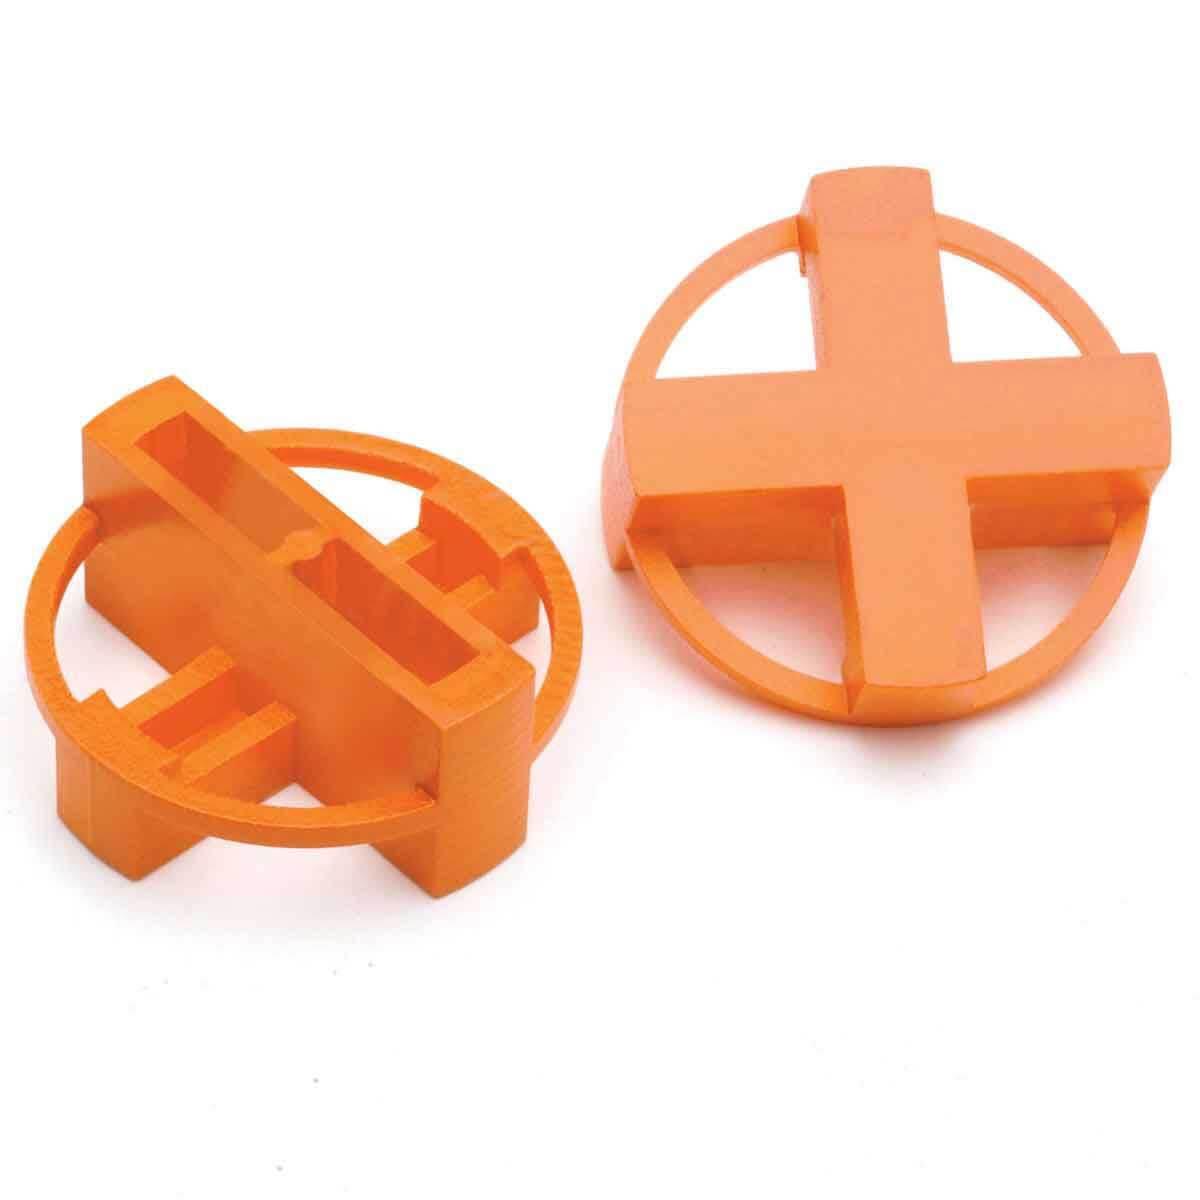 Orange Tavy 4-Corner View Tile Spacers 1006